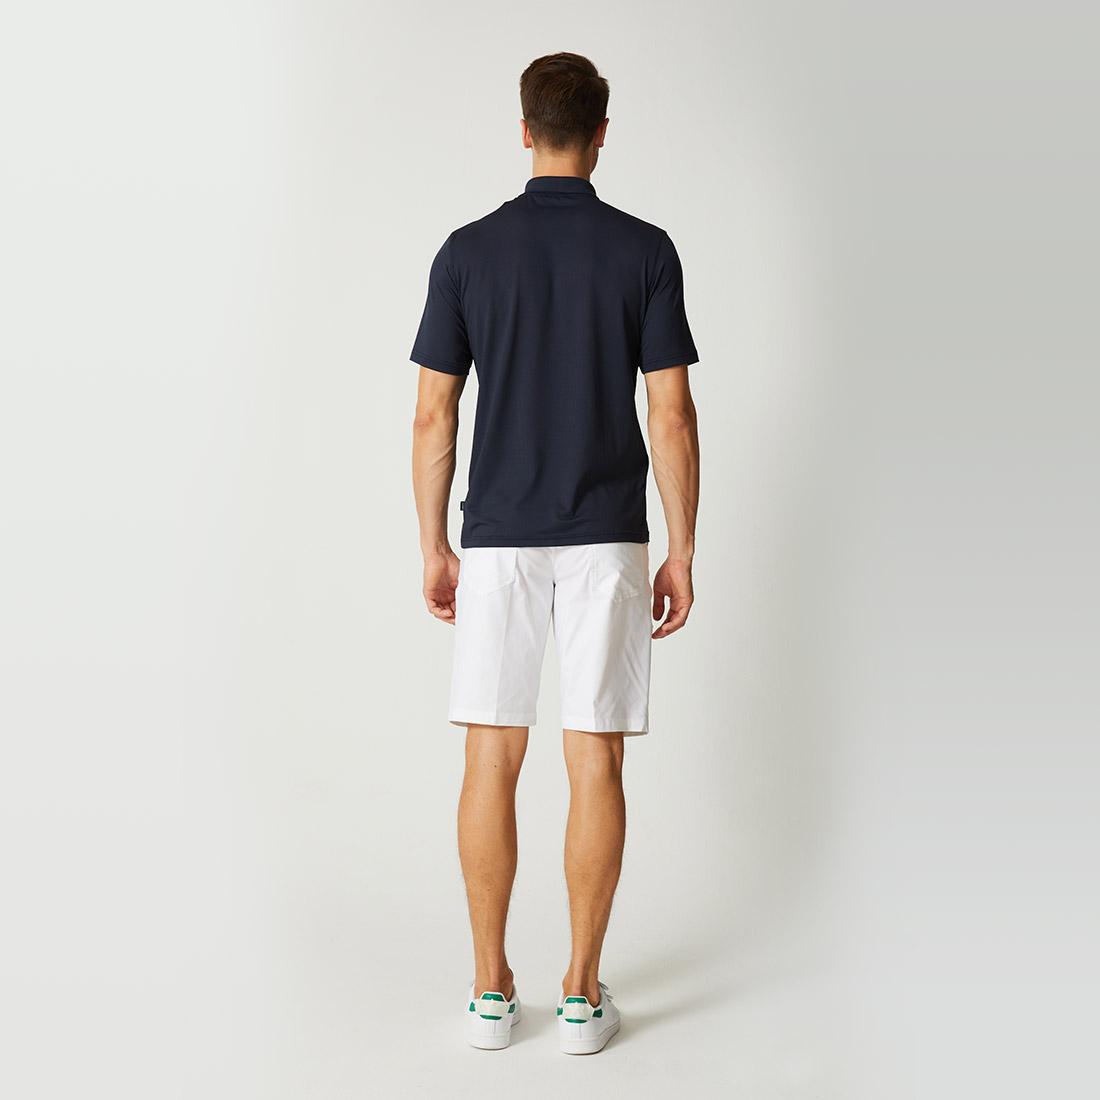 Herren kurzarm Funktions-Golfpolo aus besonders hochwertigem Jacquard